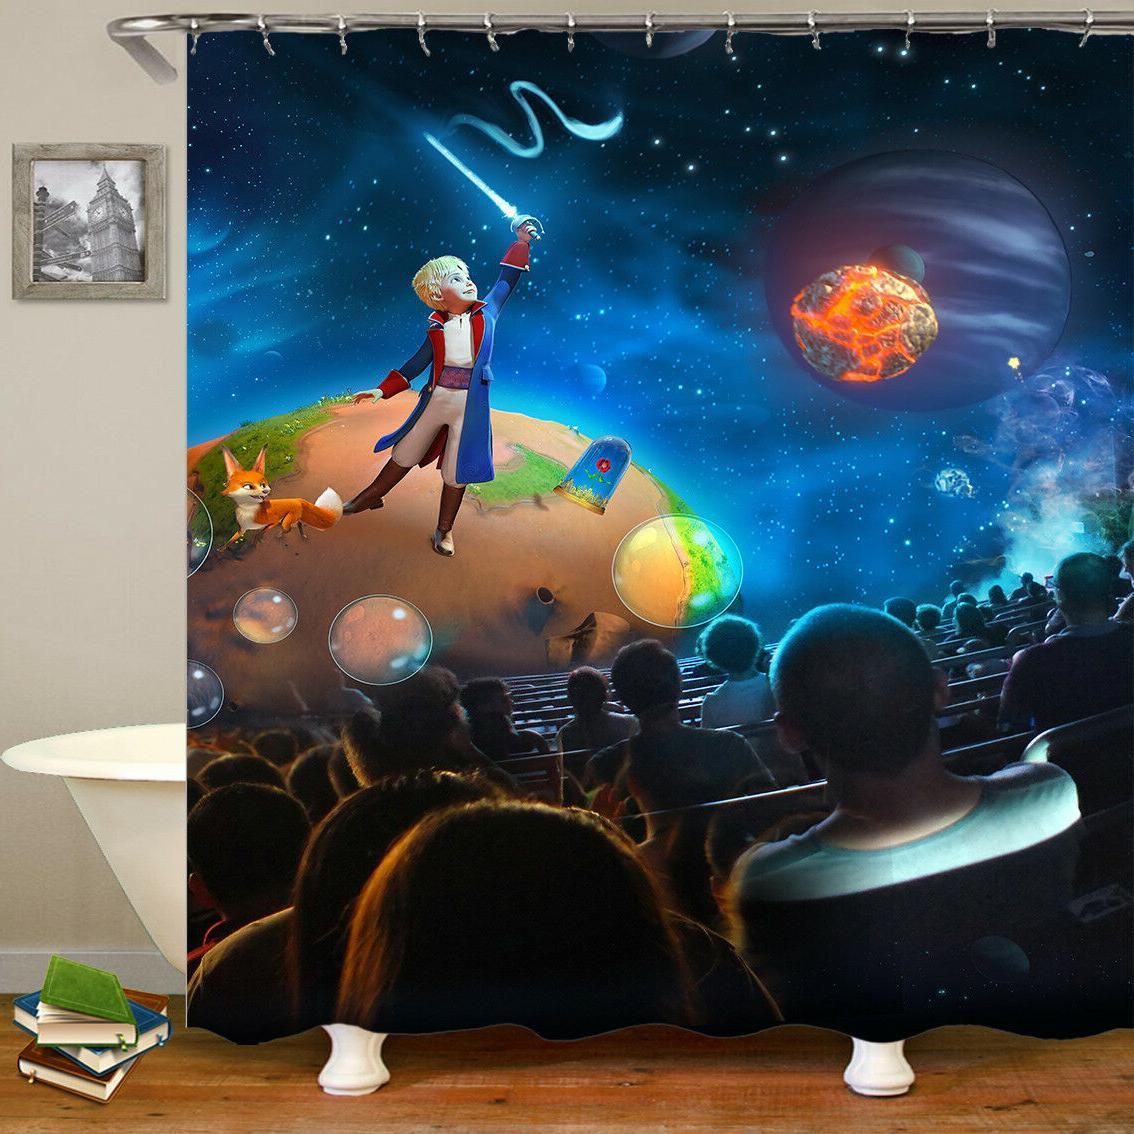 Disney Fabric Curtain With